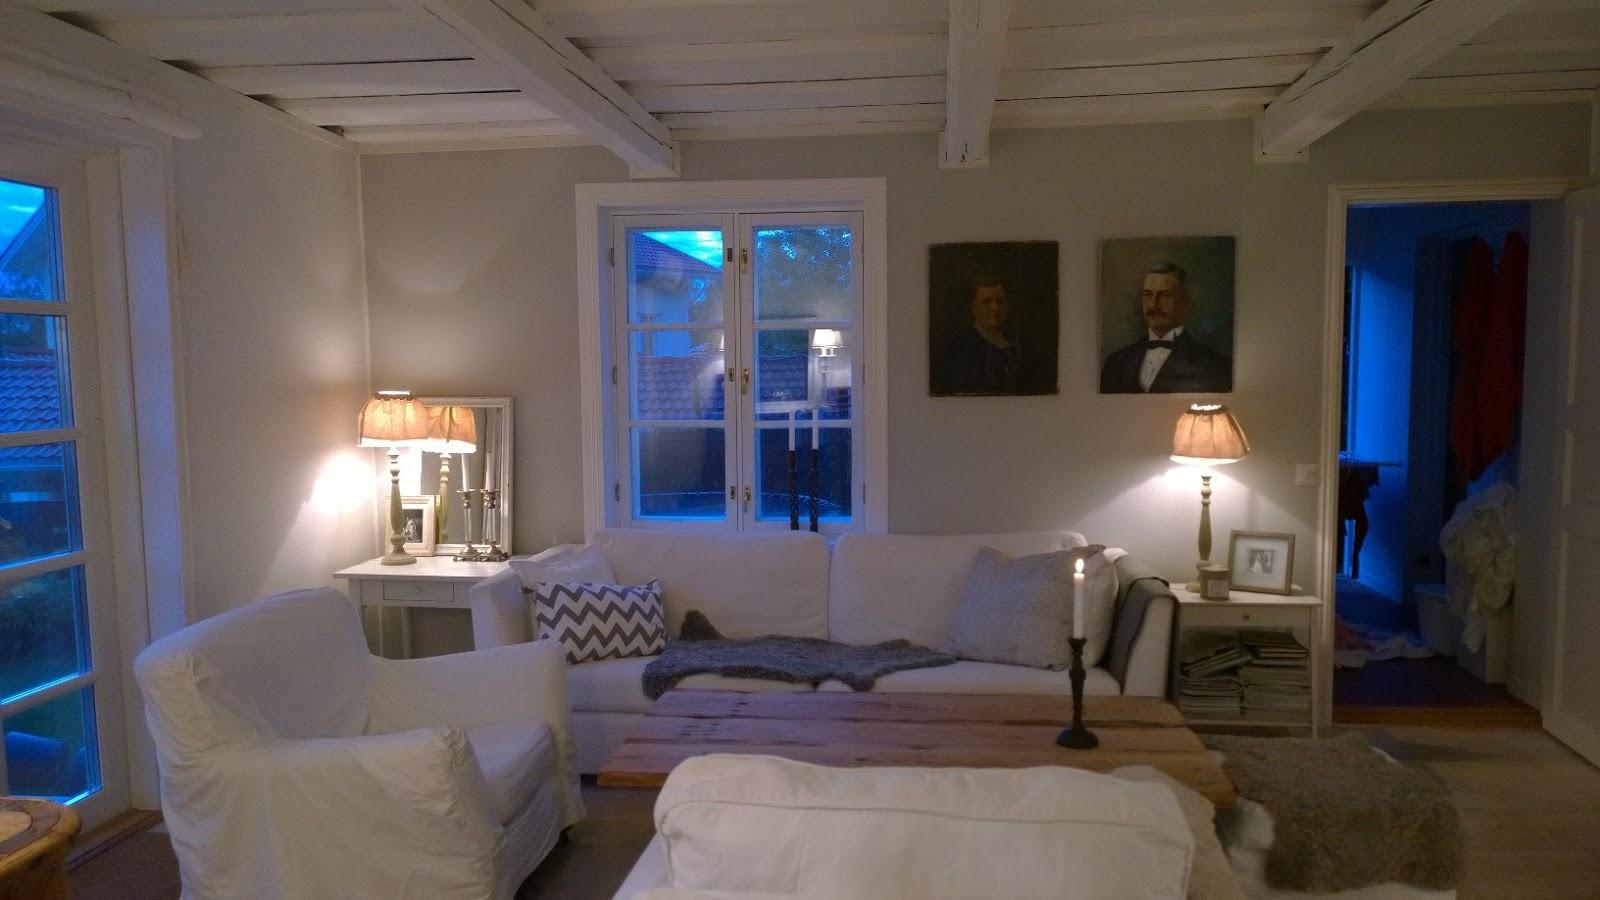 Livet under eken i dalsvik  : målade vardagsrummet med kalkitir färg